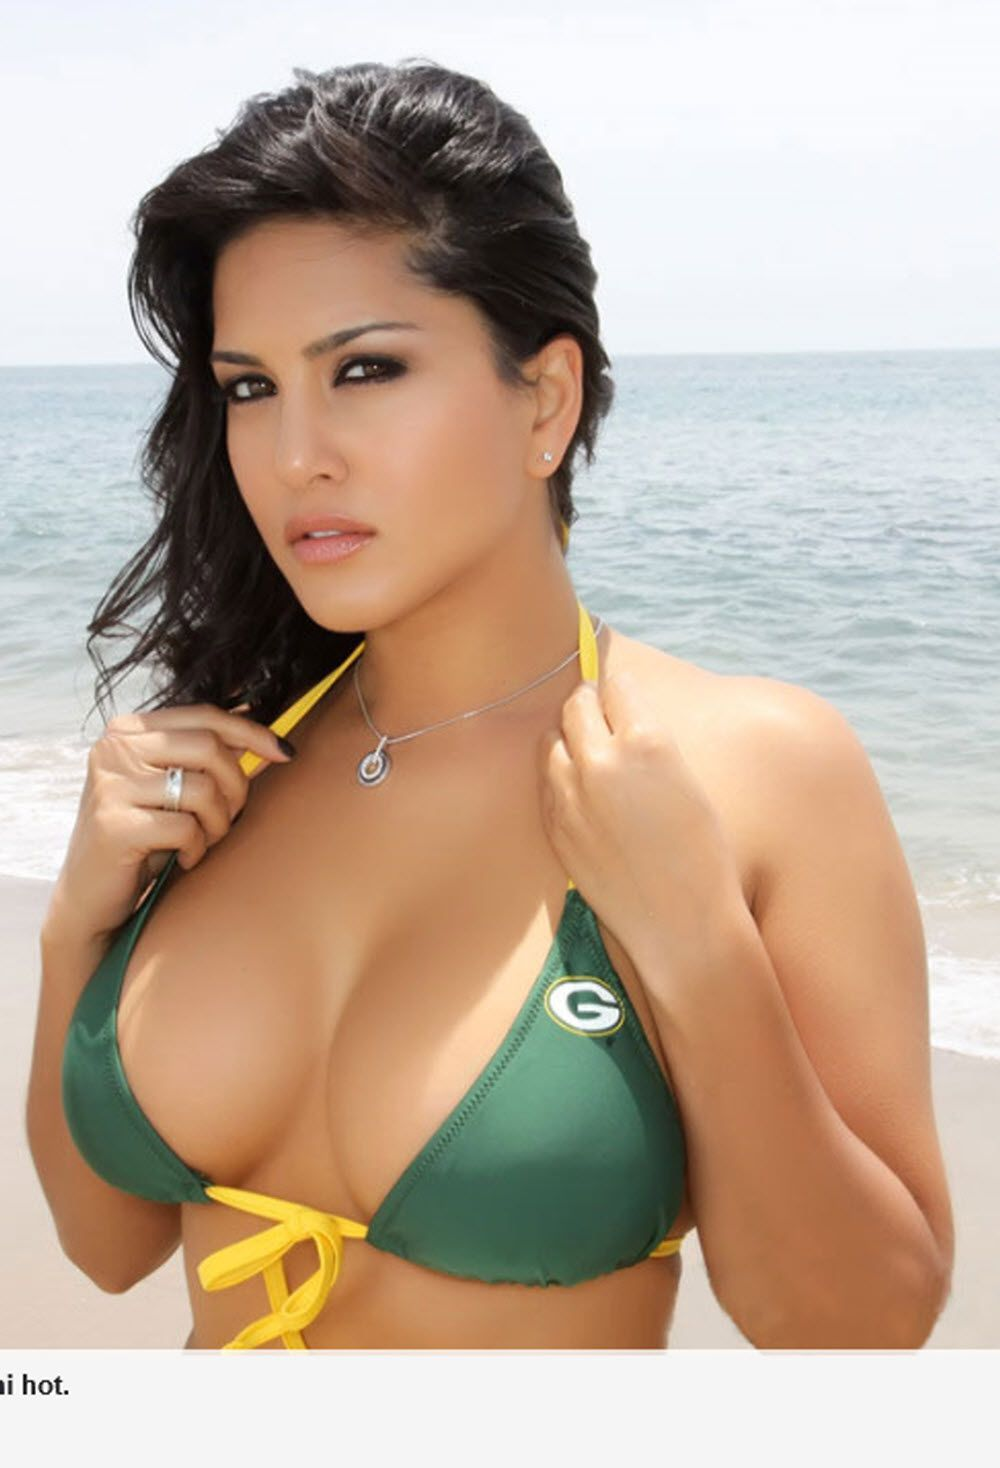 Sunny Sunny Leone Ki Bf Film Sex Wala Film Bf Photo Sexy